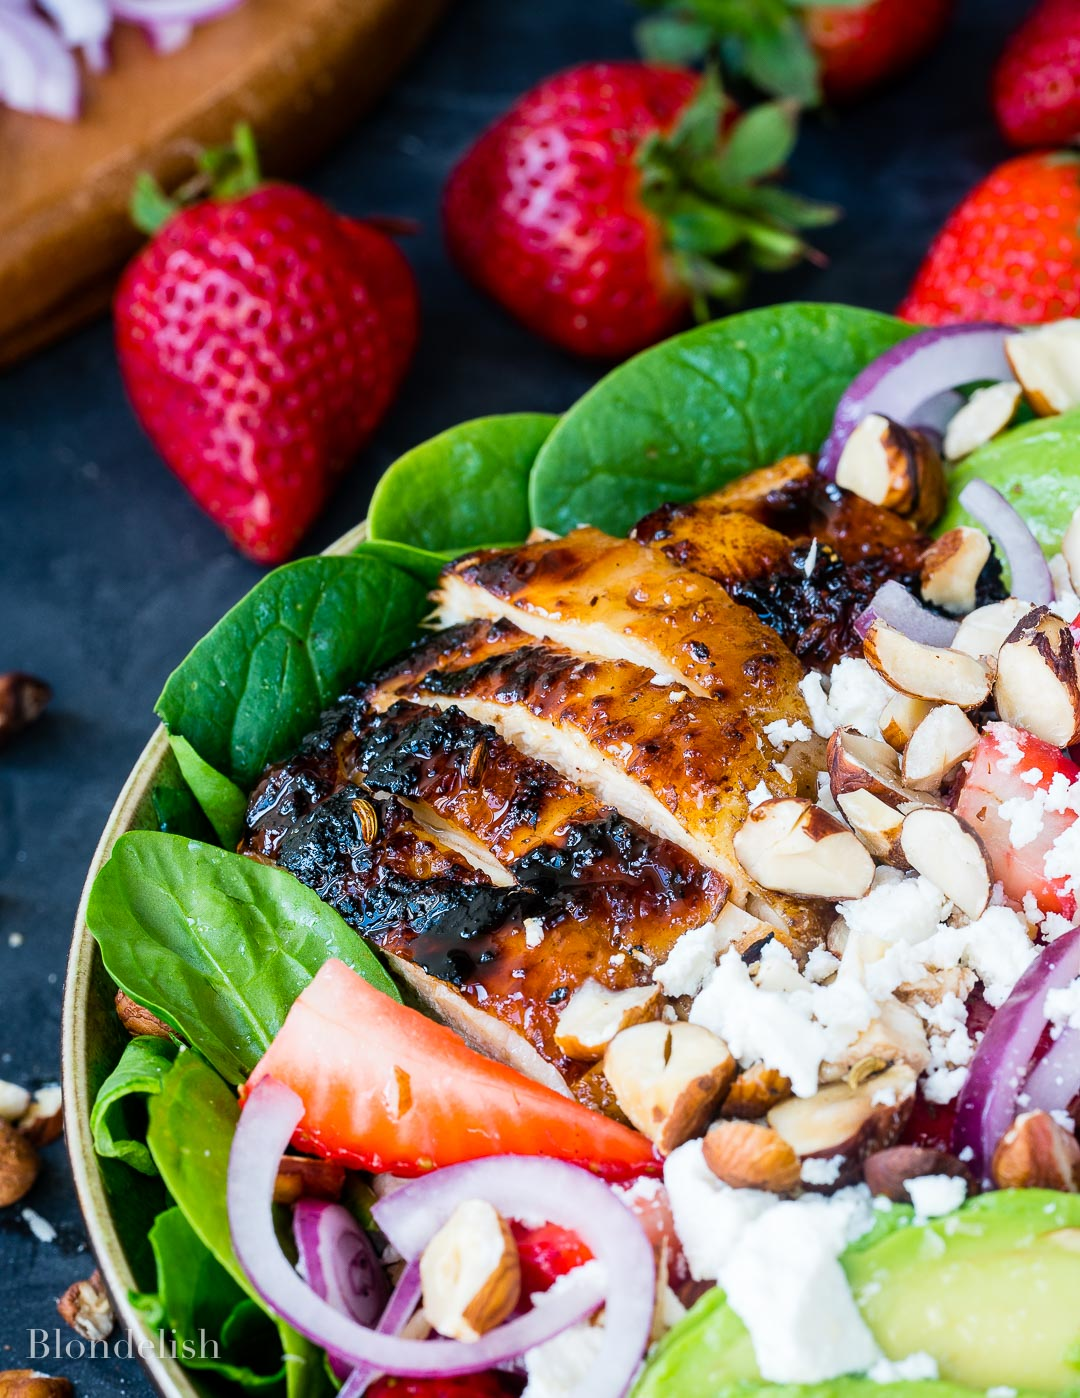 Best Strawberry and Avocado Chicken Salad Recipe 2 - How to make Chicken Salad